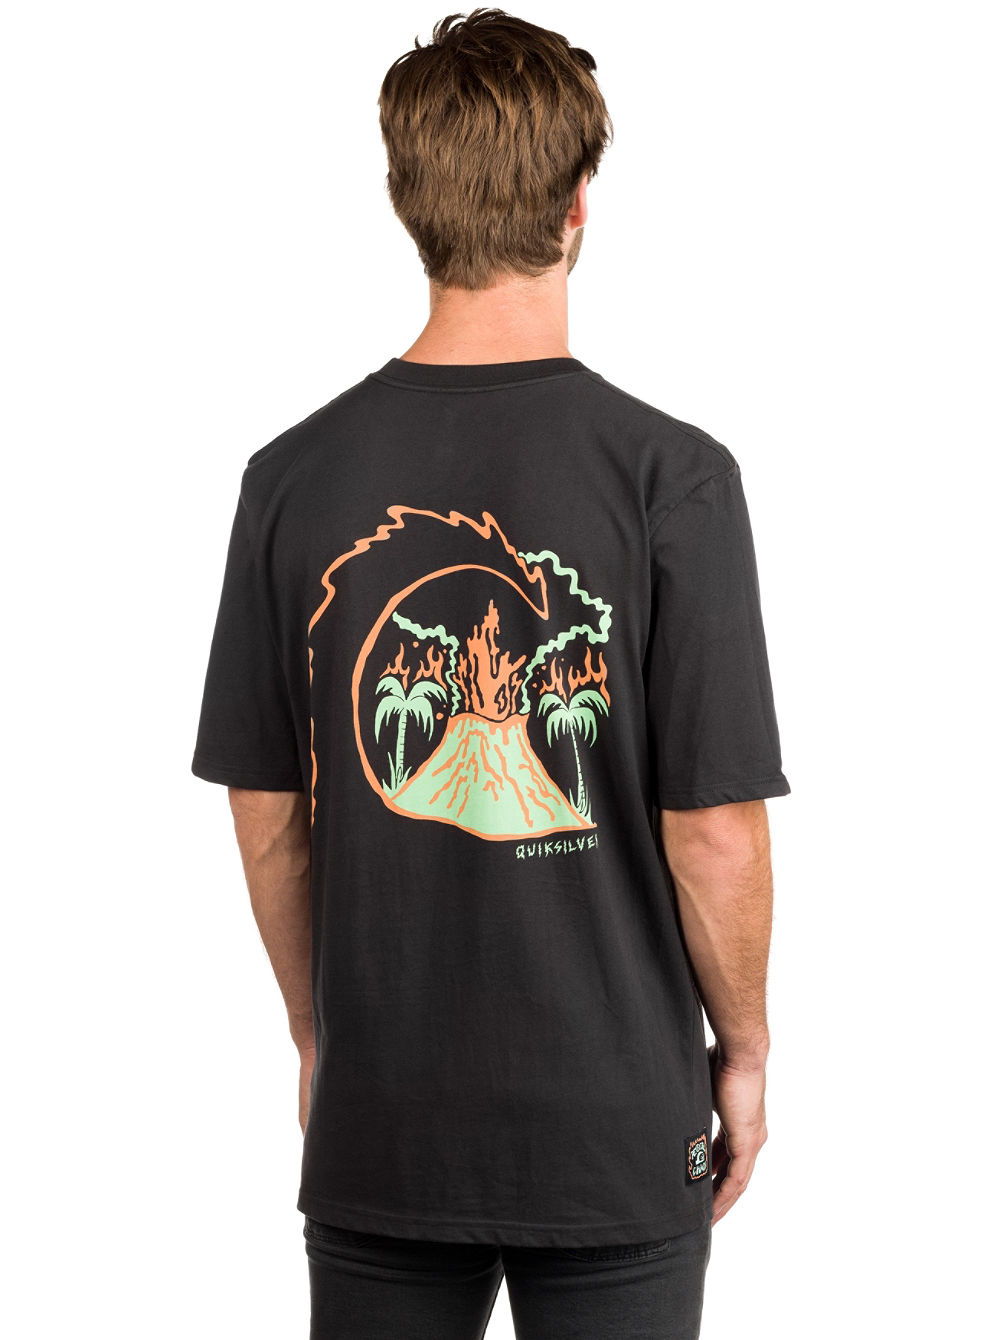 e57979745efbd Compra Quiksilver Pc Volcano Camiseta en línea en blue-tomato.com